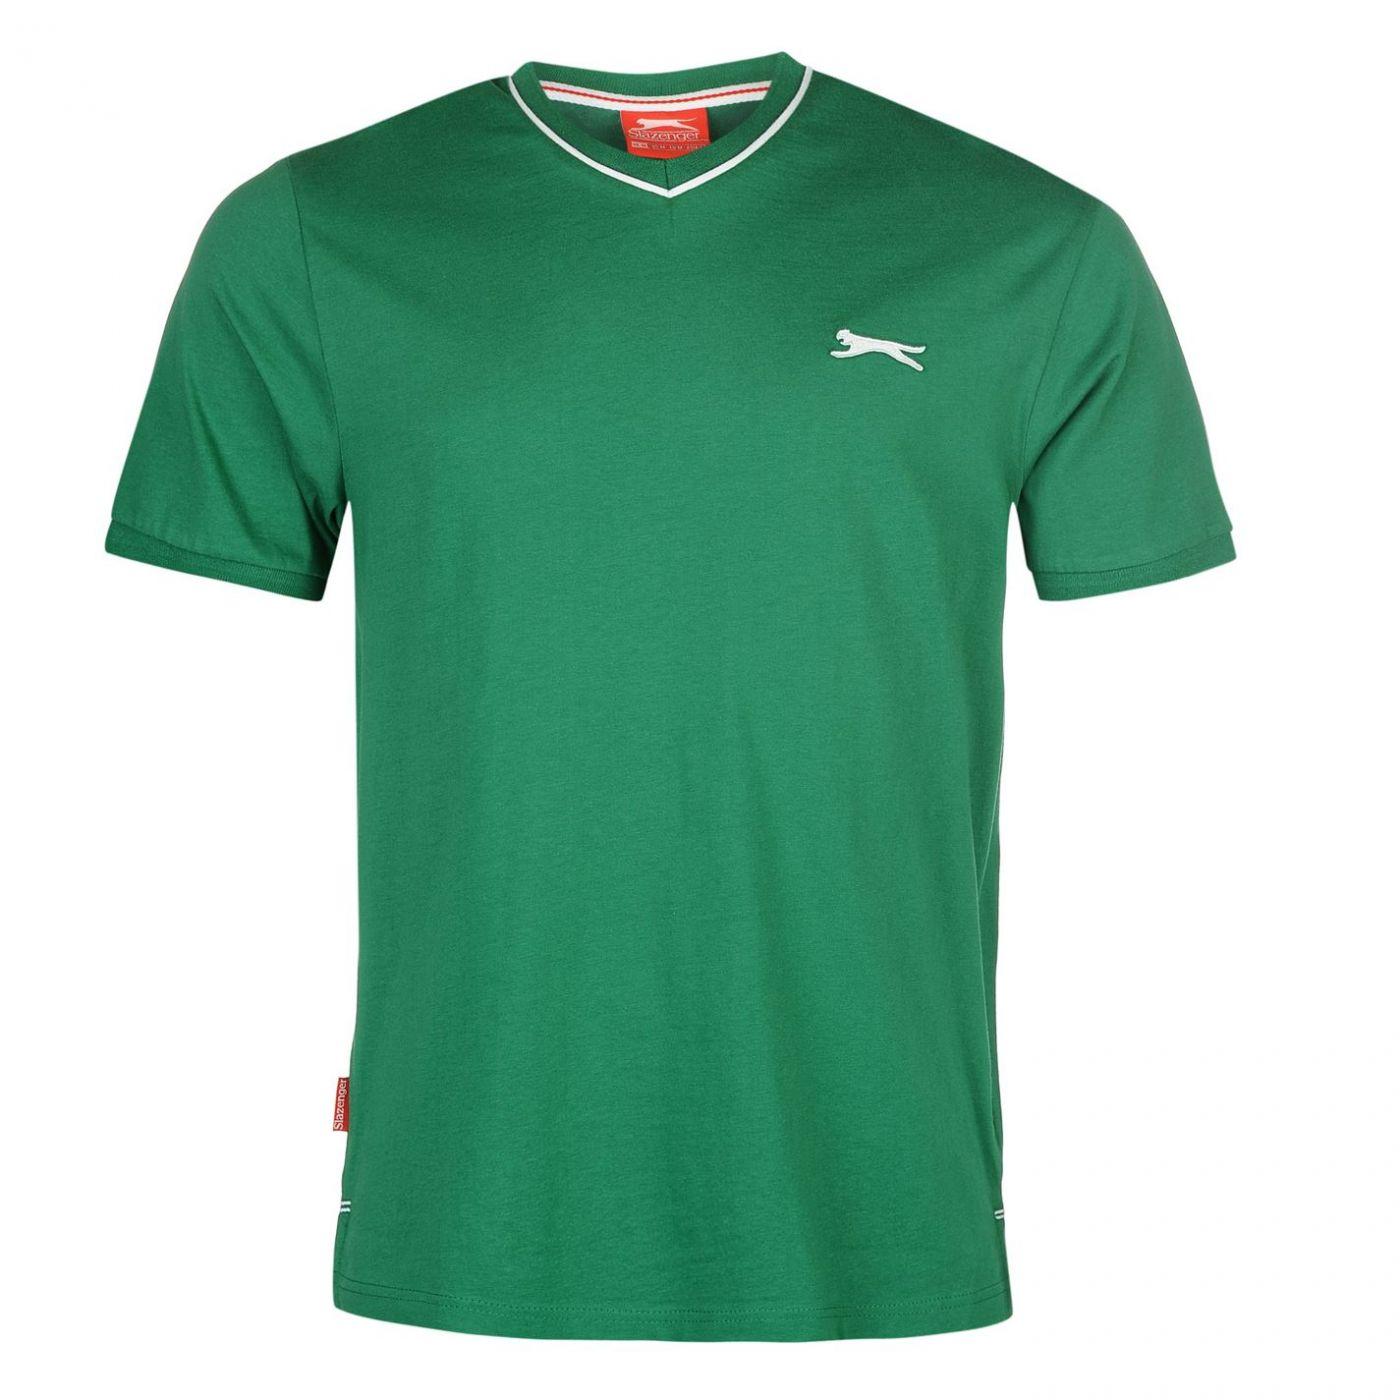 Triko Triko Slazenger V Neck T Shirt pánské